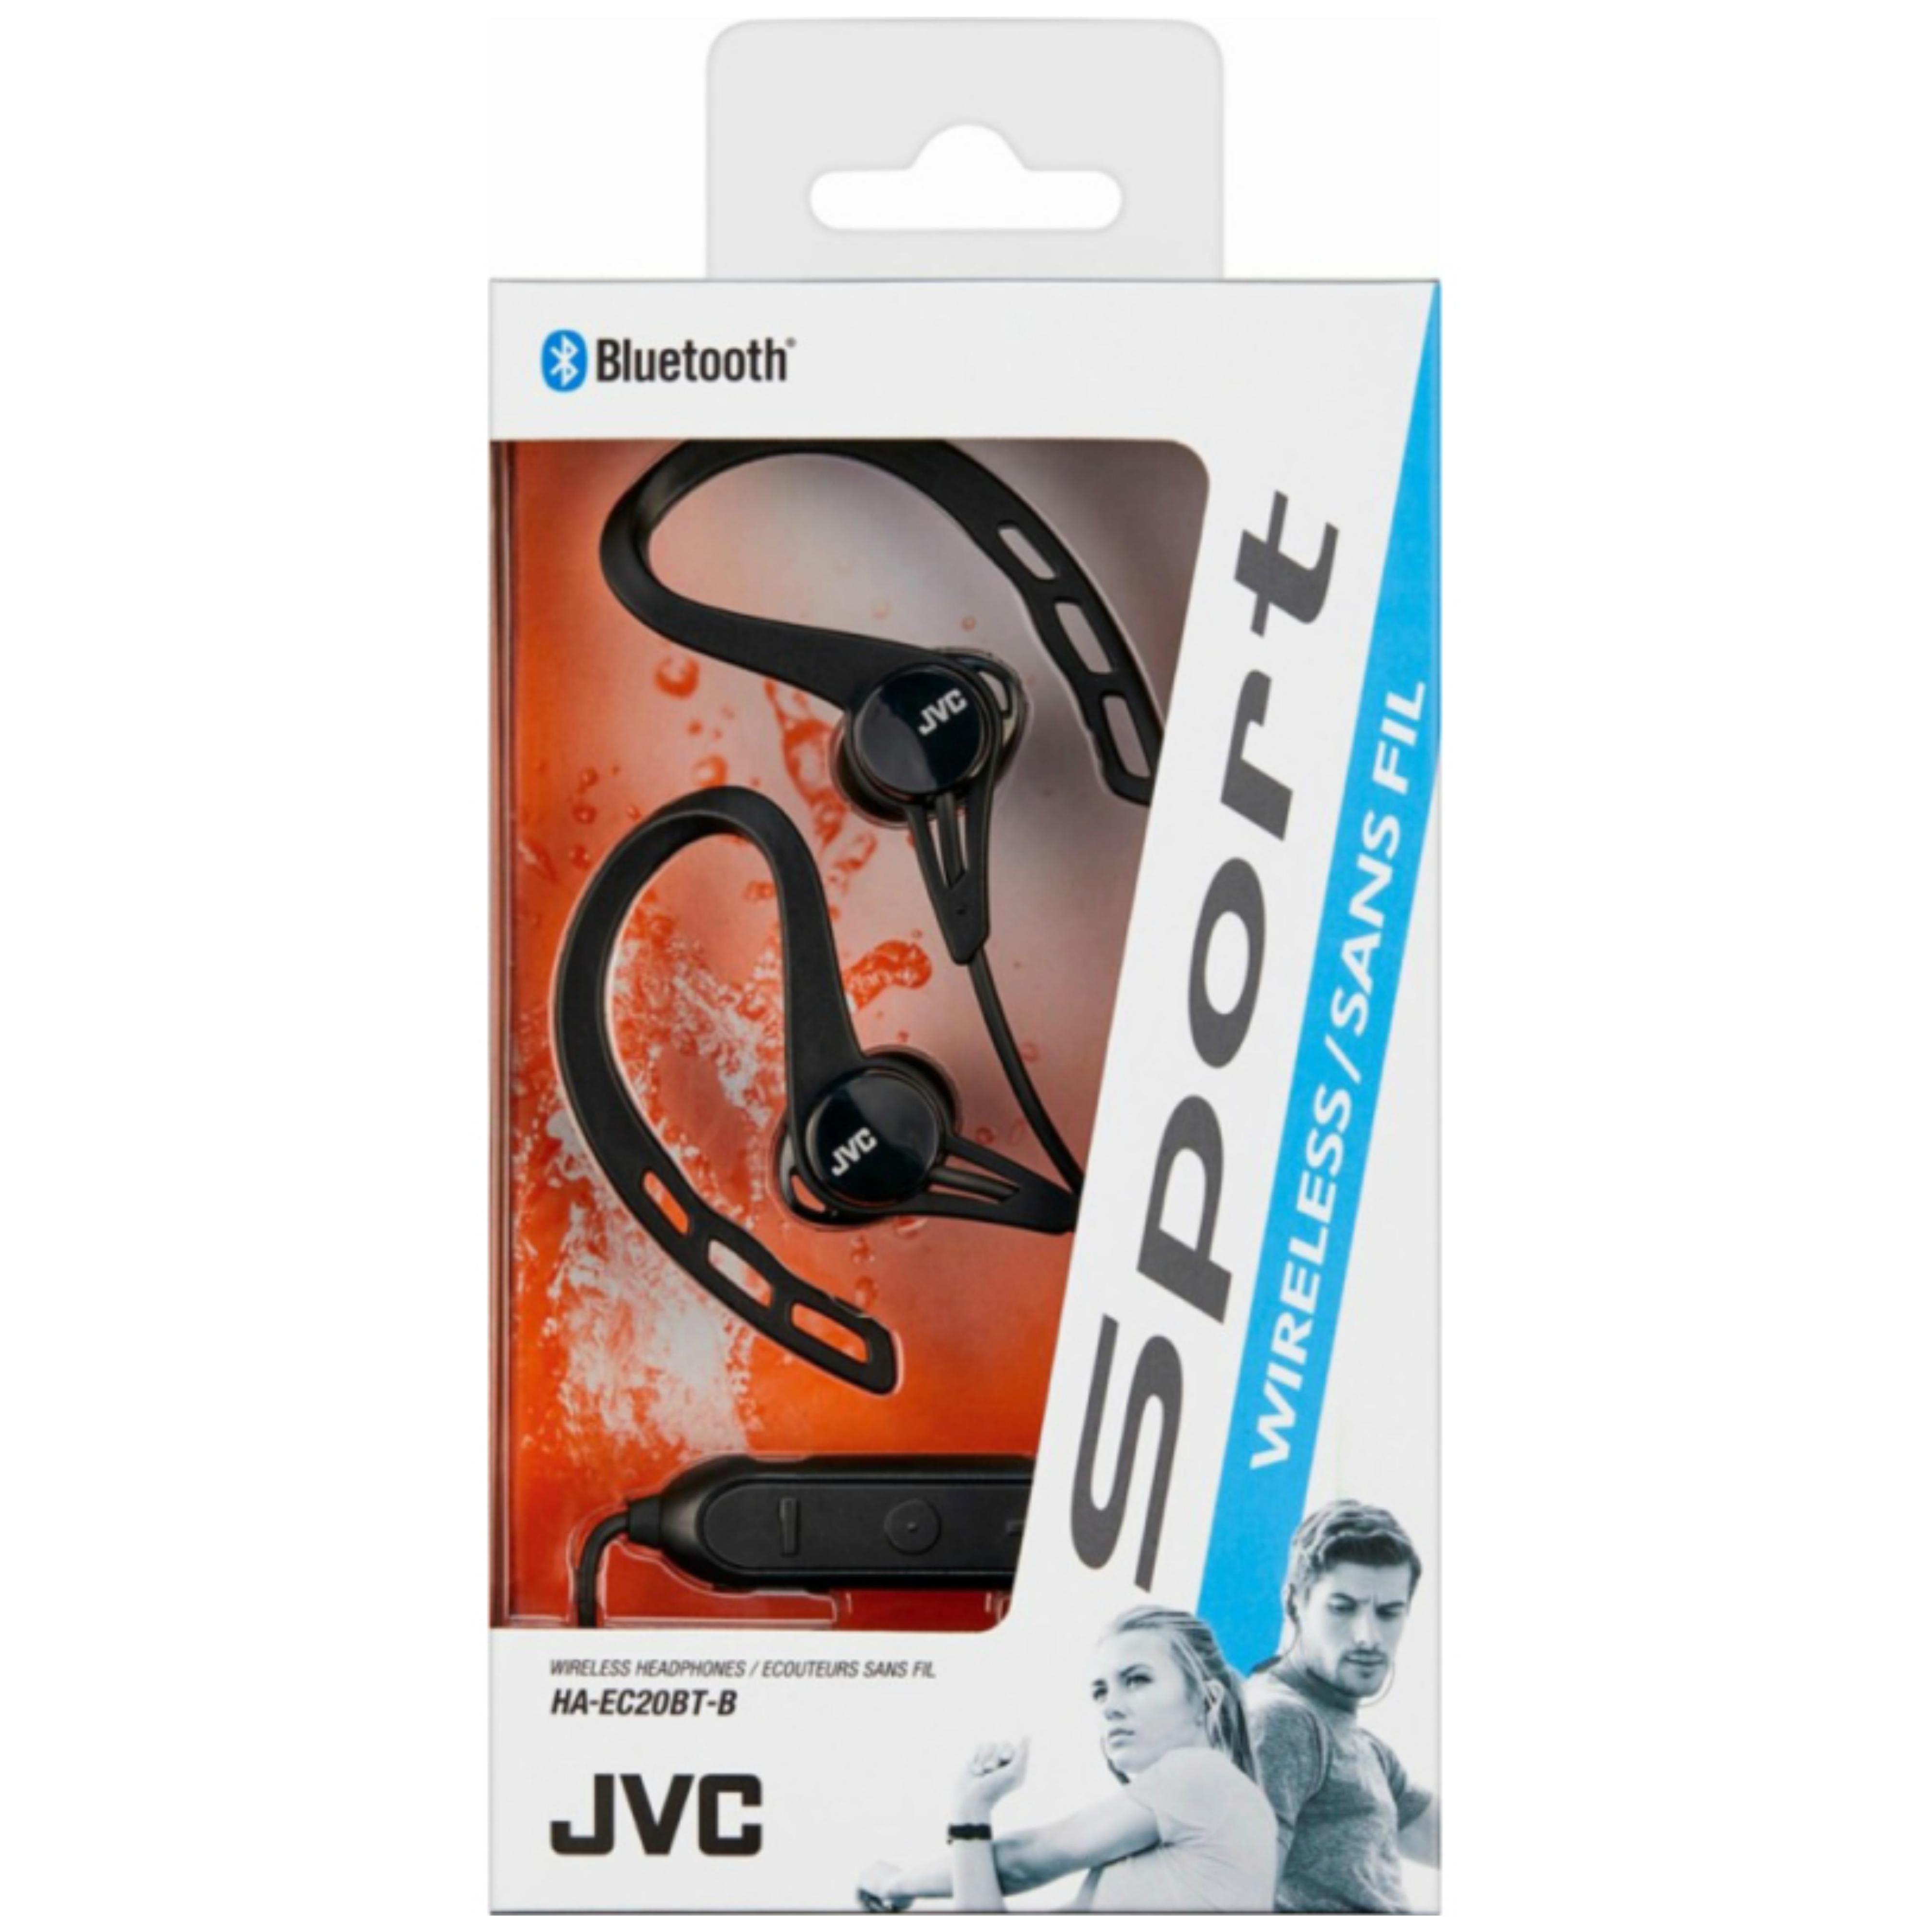 f98c8ddb7c9 JVC HAEC20BTBE Sports Headphones Stereo Wireless Bluetooth Ear Clip In Ear